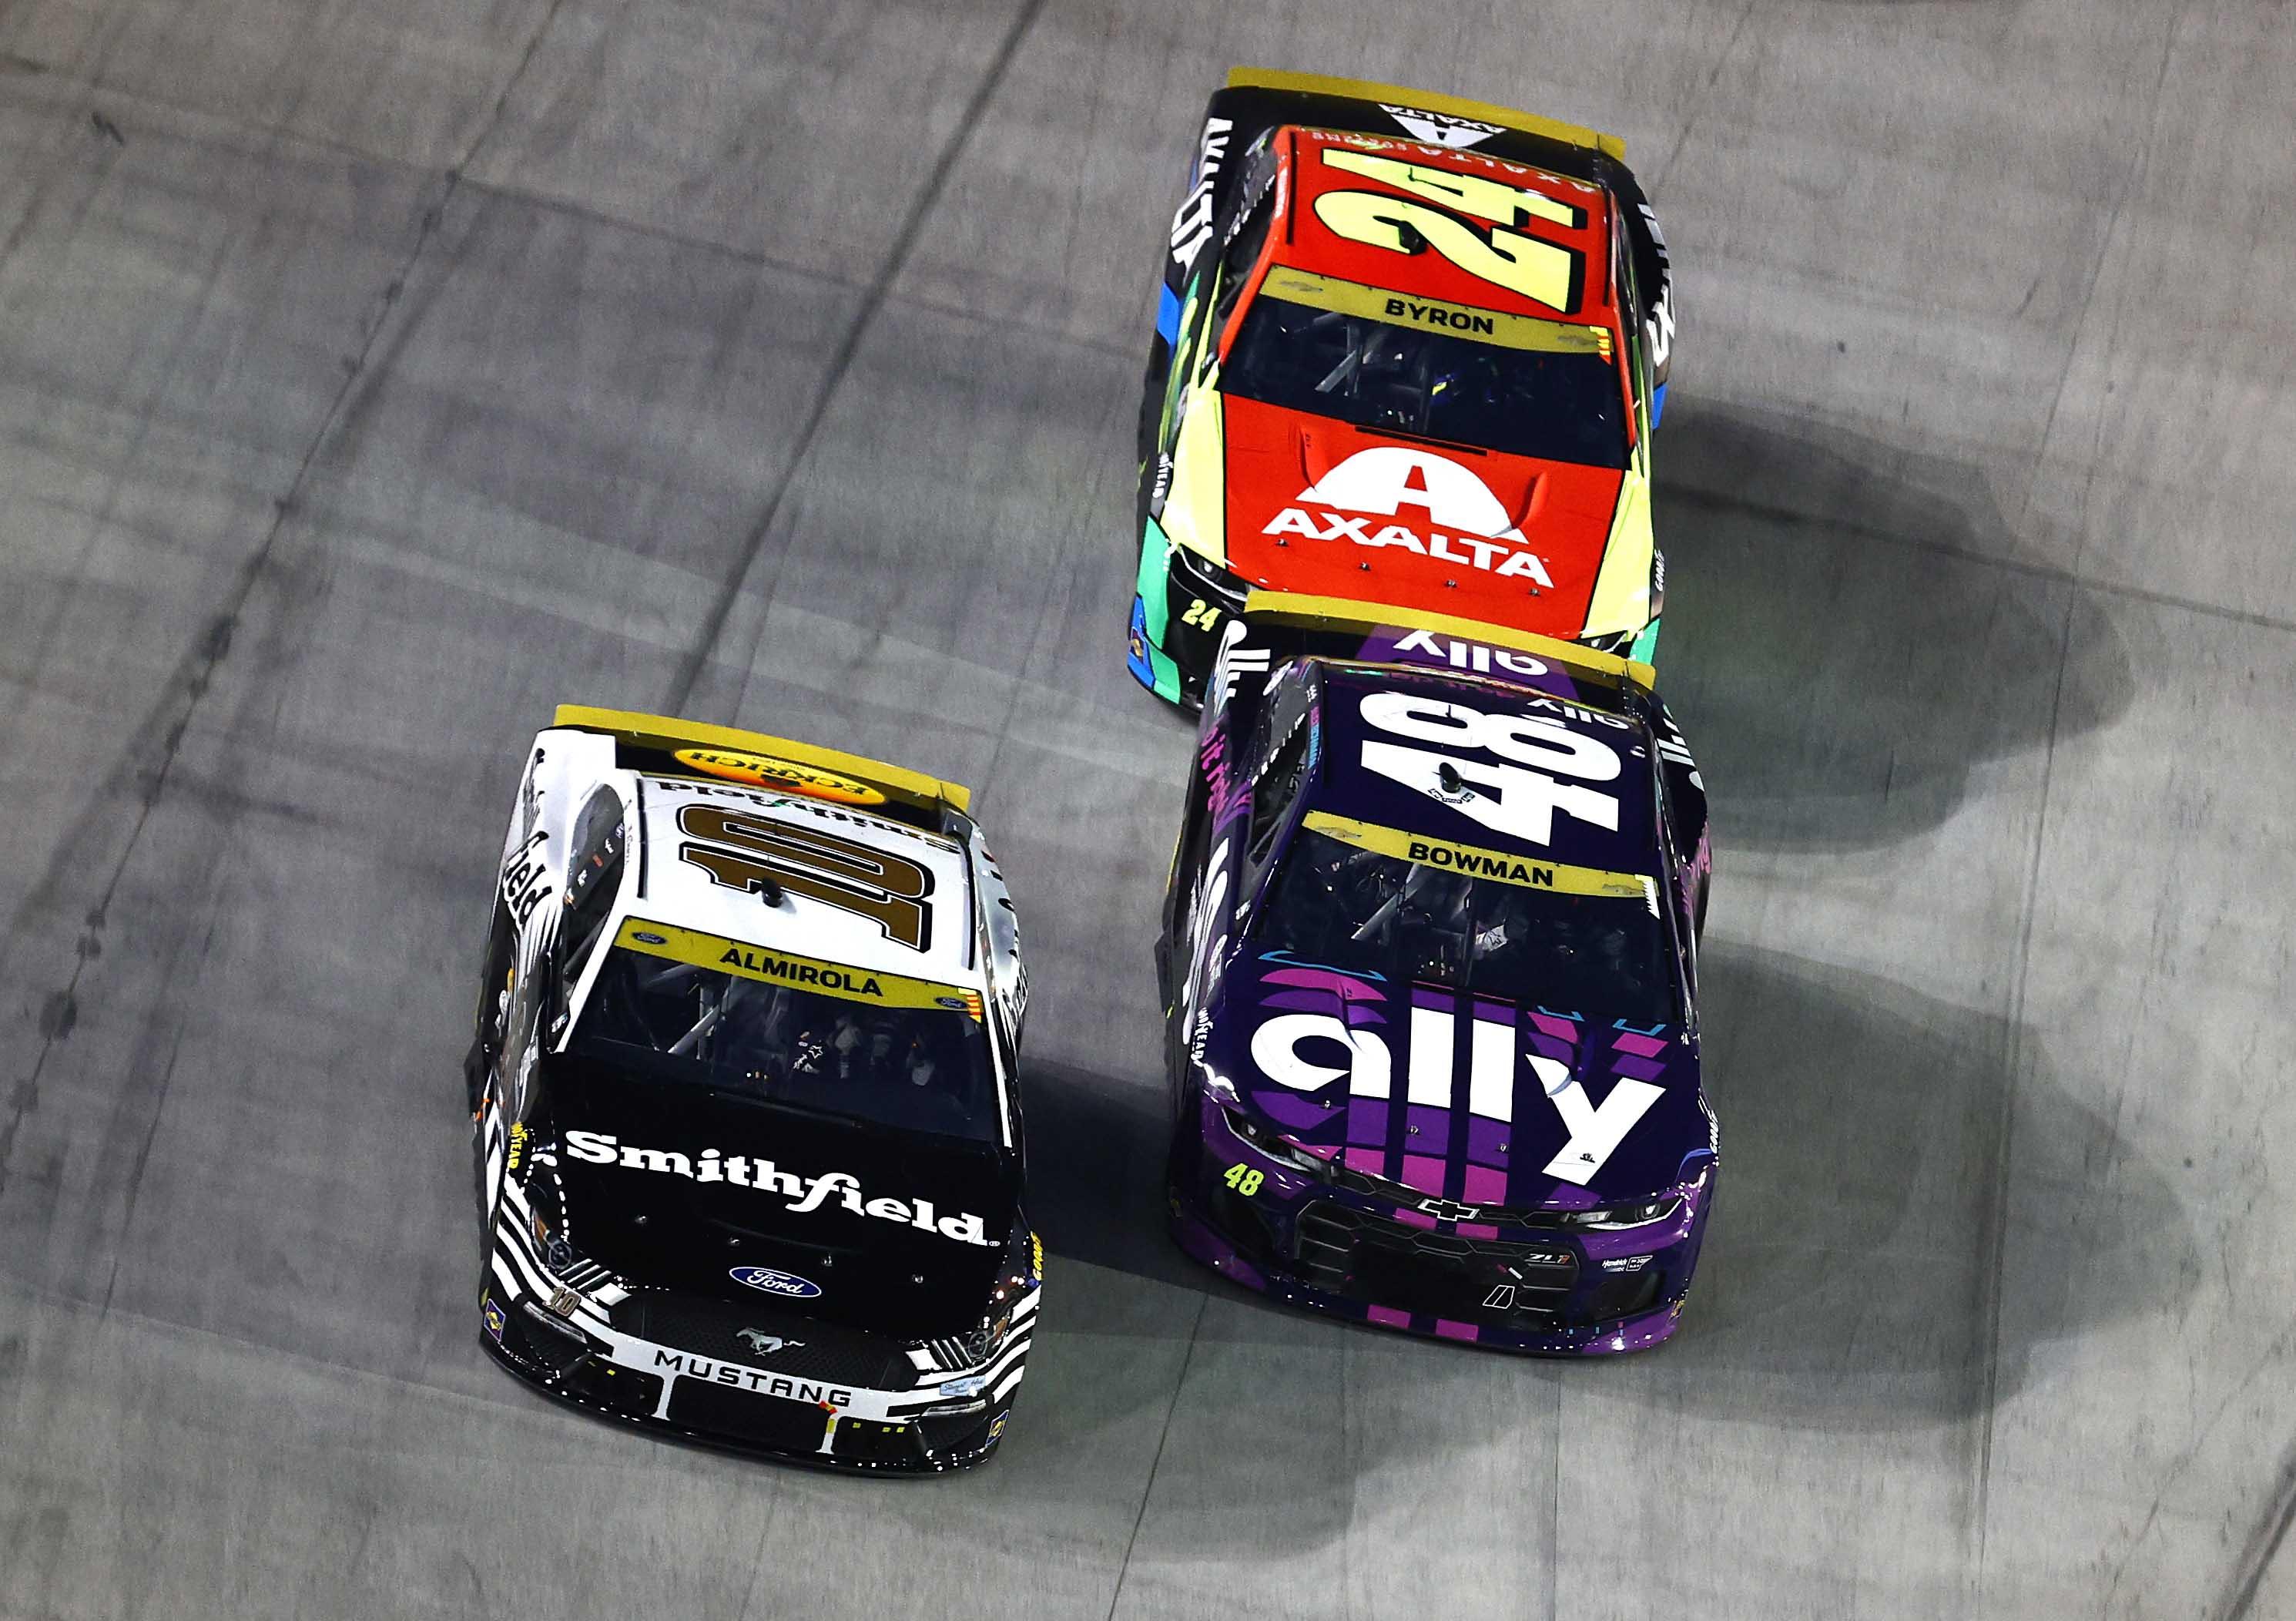 Aric Almirola, Alex Bowman, William Byron - Bristol Motor Speedway - NASCAR Cup Series